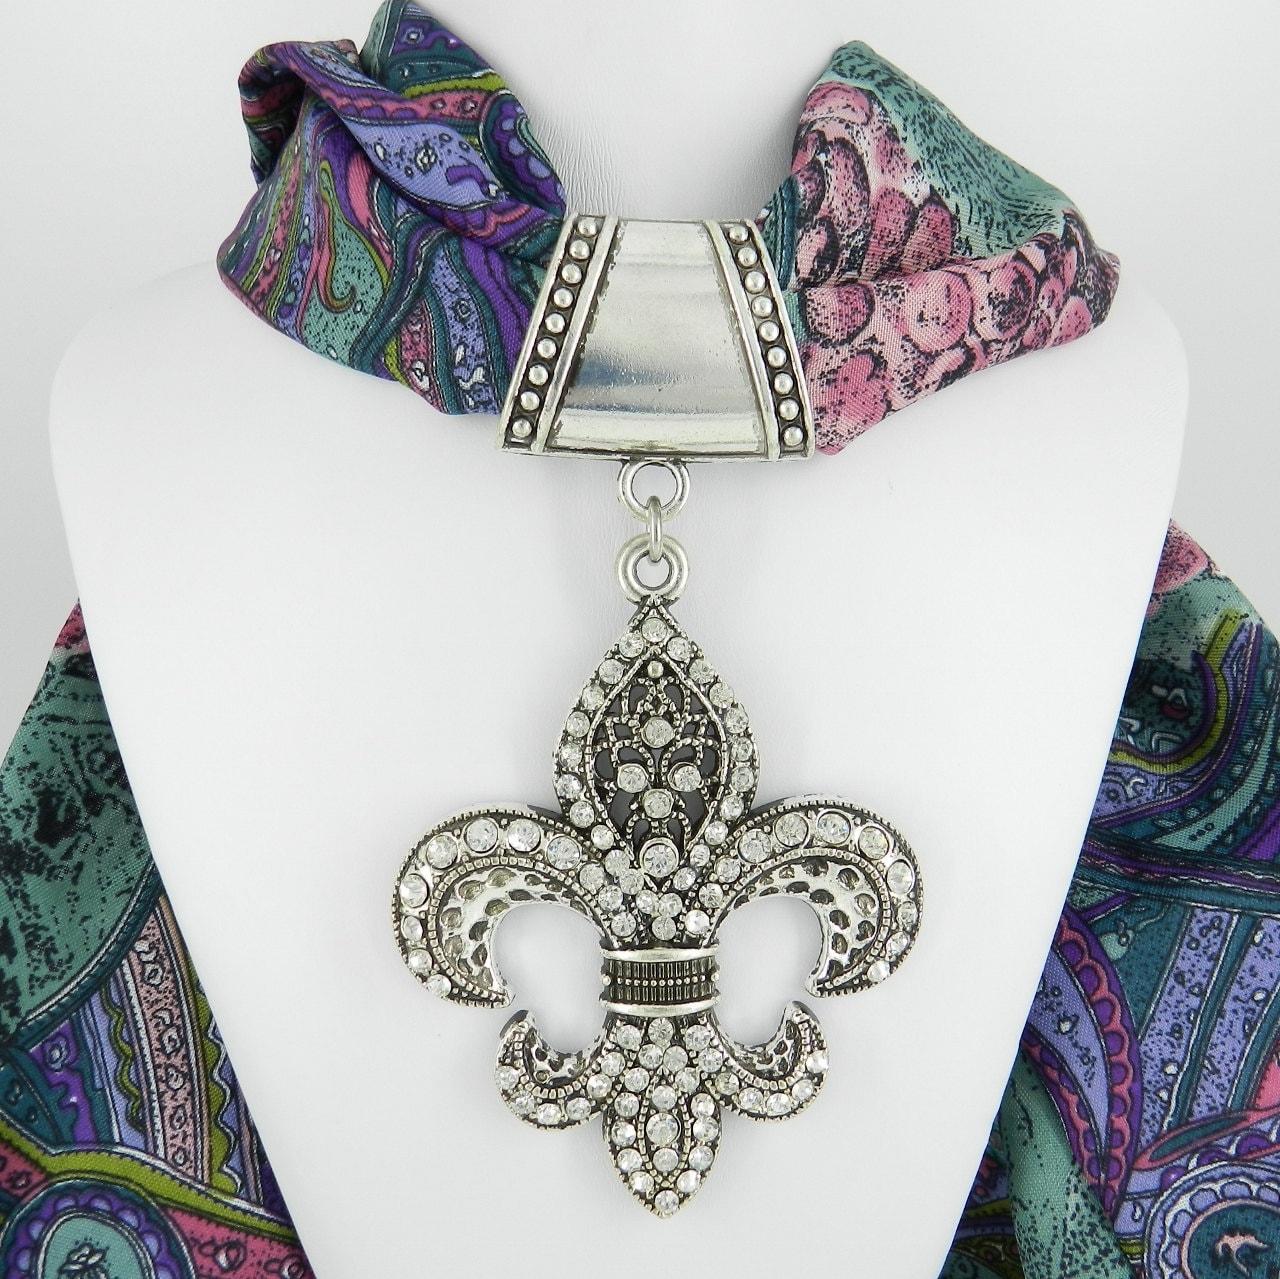 Fleur-de-Lis,Scarf,Slide,with,Crystal,Rhinestones,Jewelry,scarf_charm,scarf_accessory,scarf_pendant,scarf_jewelry,scarf_slide,scarf_bling,fleur_de_lis,Saints,Art_Nouveau,crystal_fleur_de_lis,rhinestone_pendant,large fleur de lis pendant,antique silver alloy bail